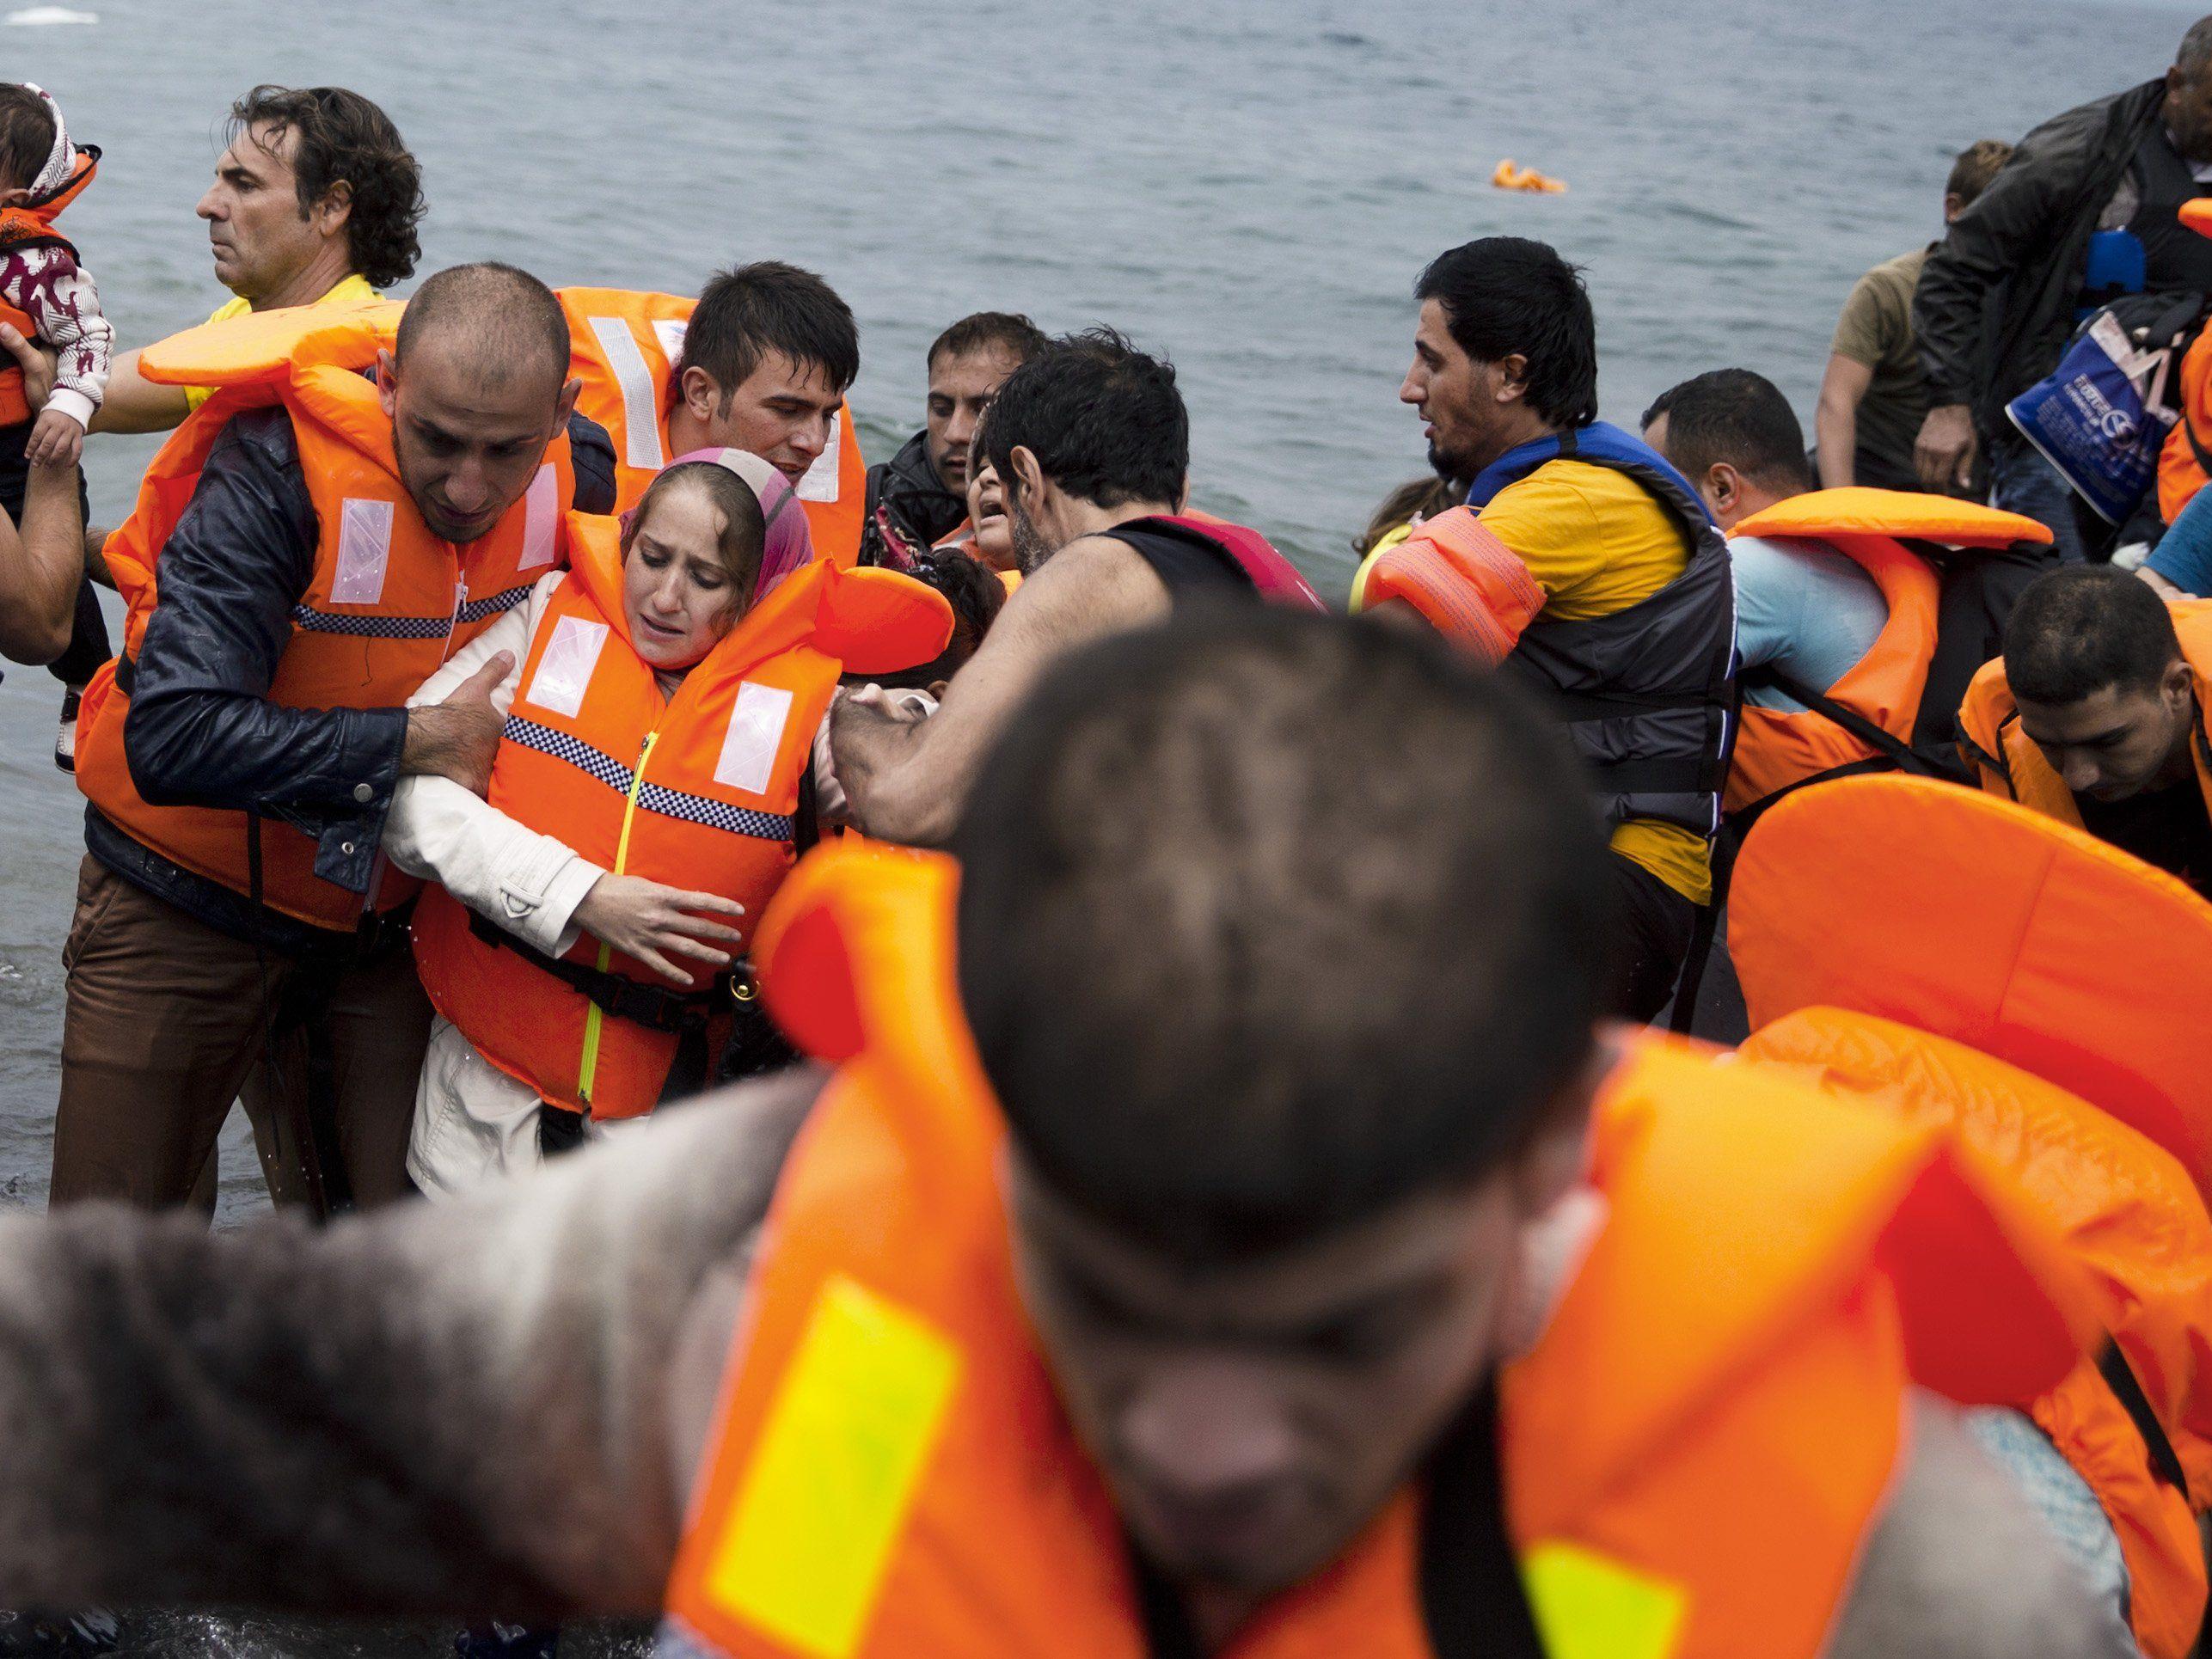 Harte Fronten vor EU-Krisentreffen zu Flüchtlingen.